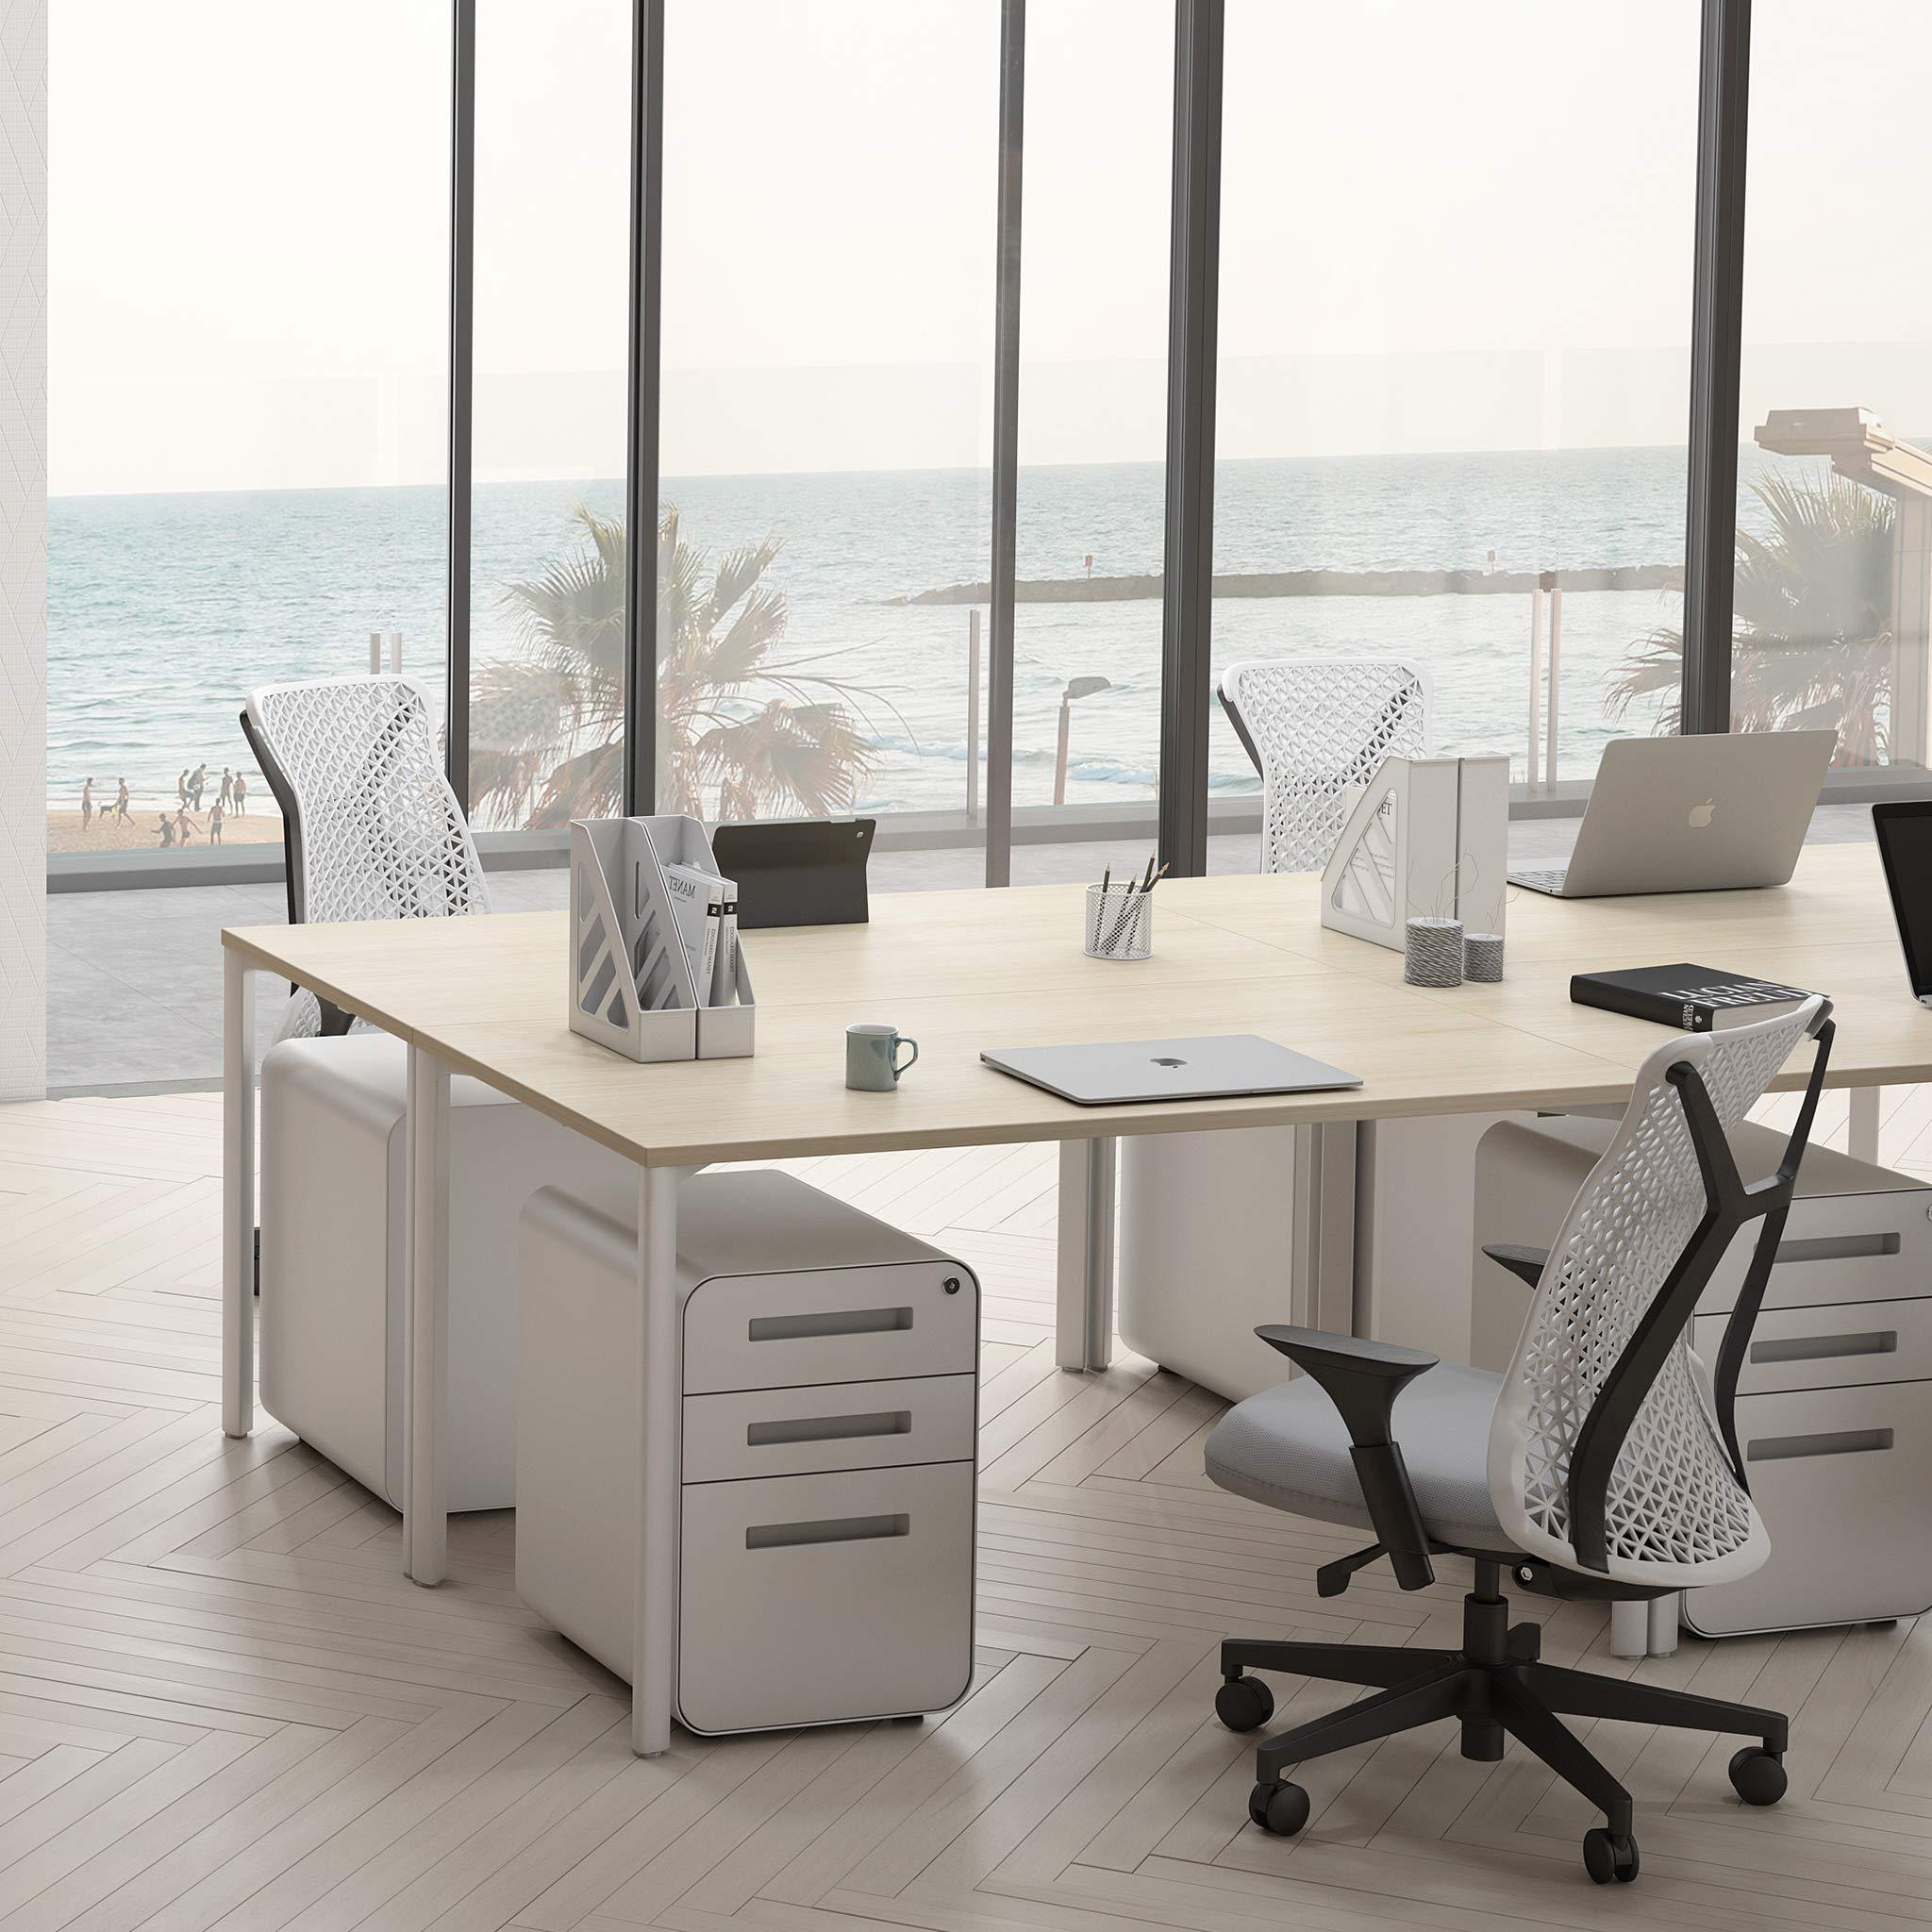 Stockpile 3-Drawer File Cabinet (White)